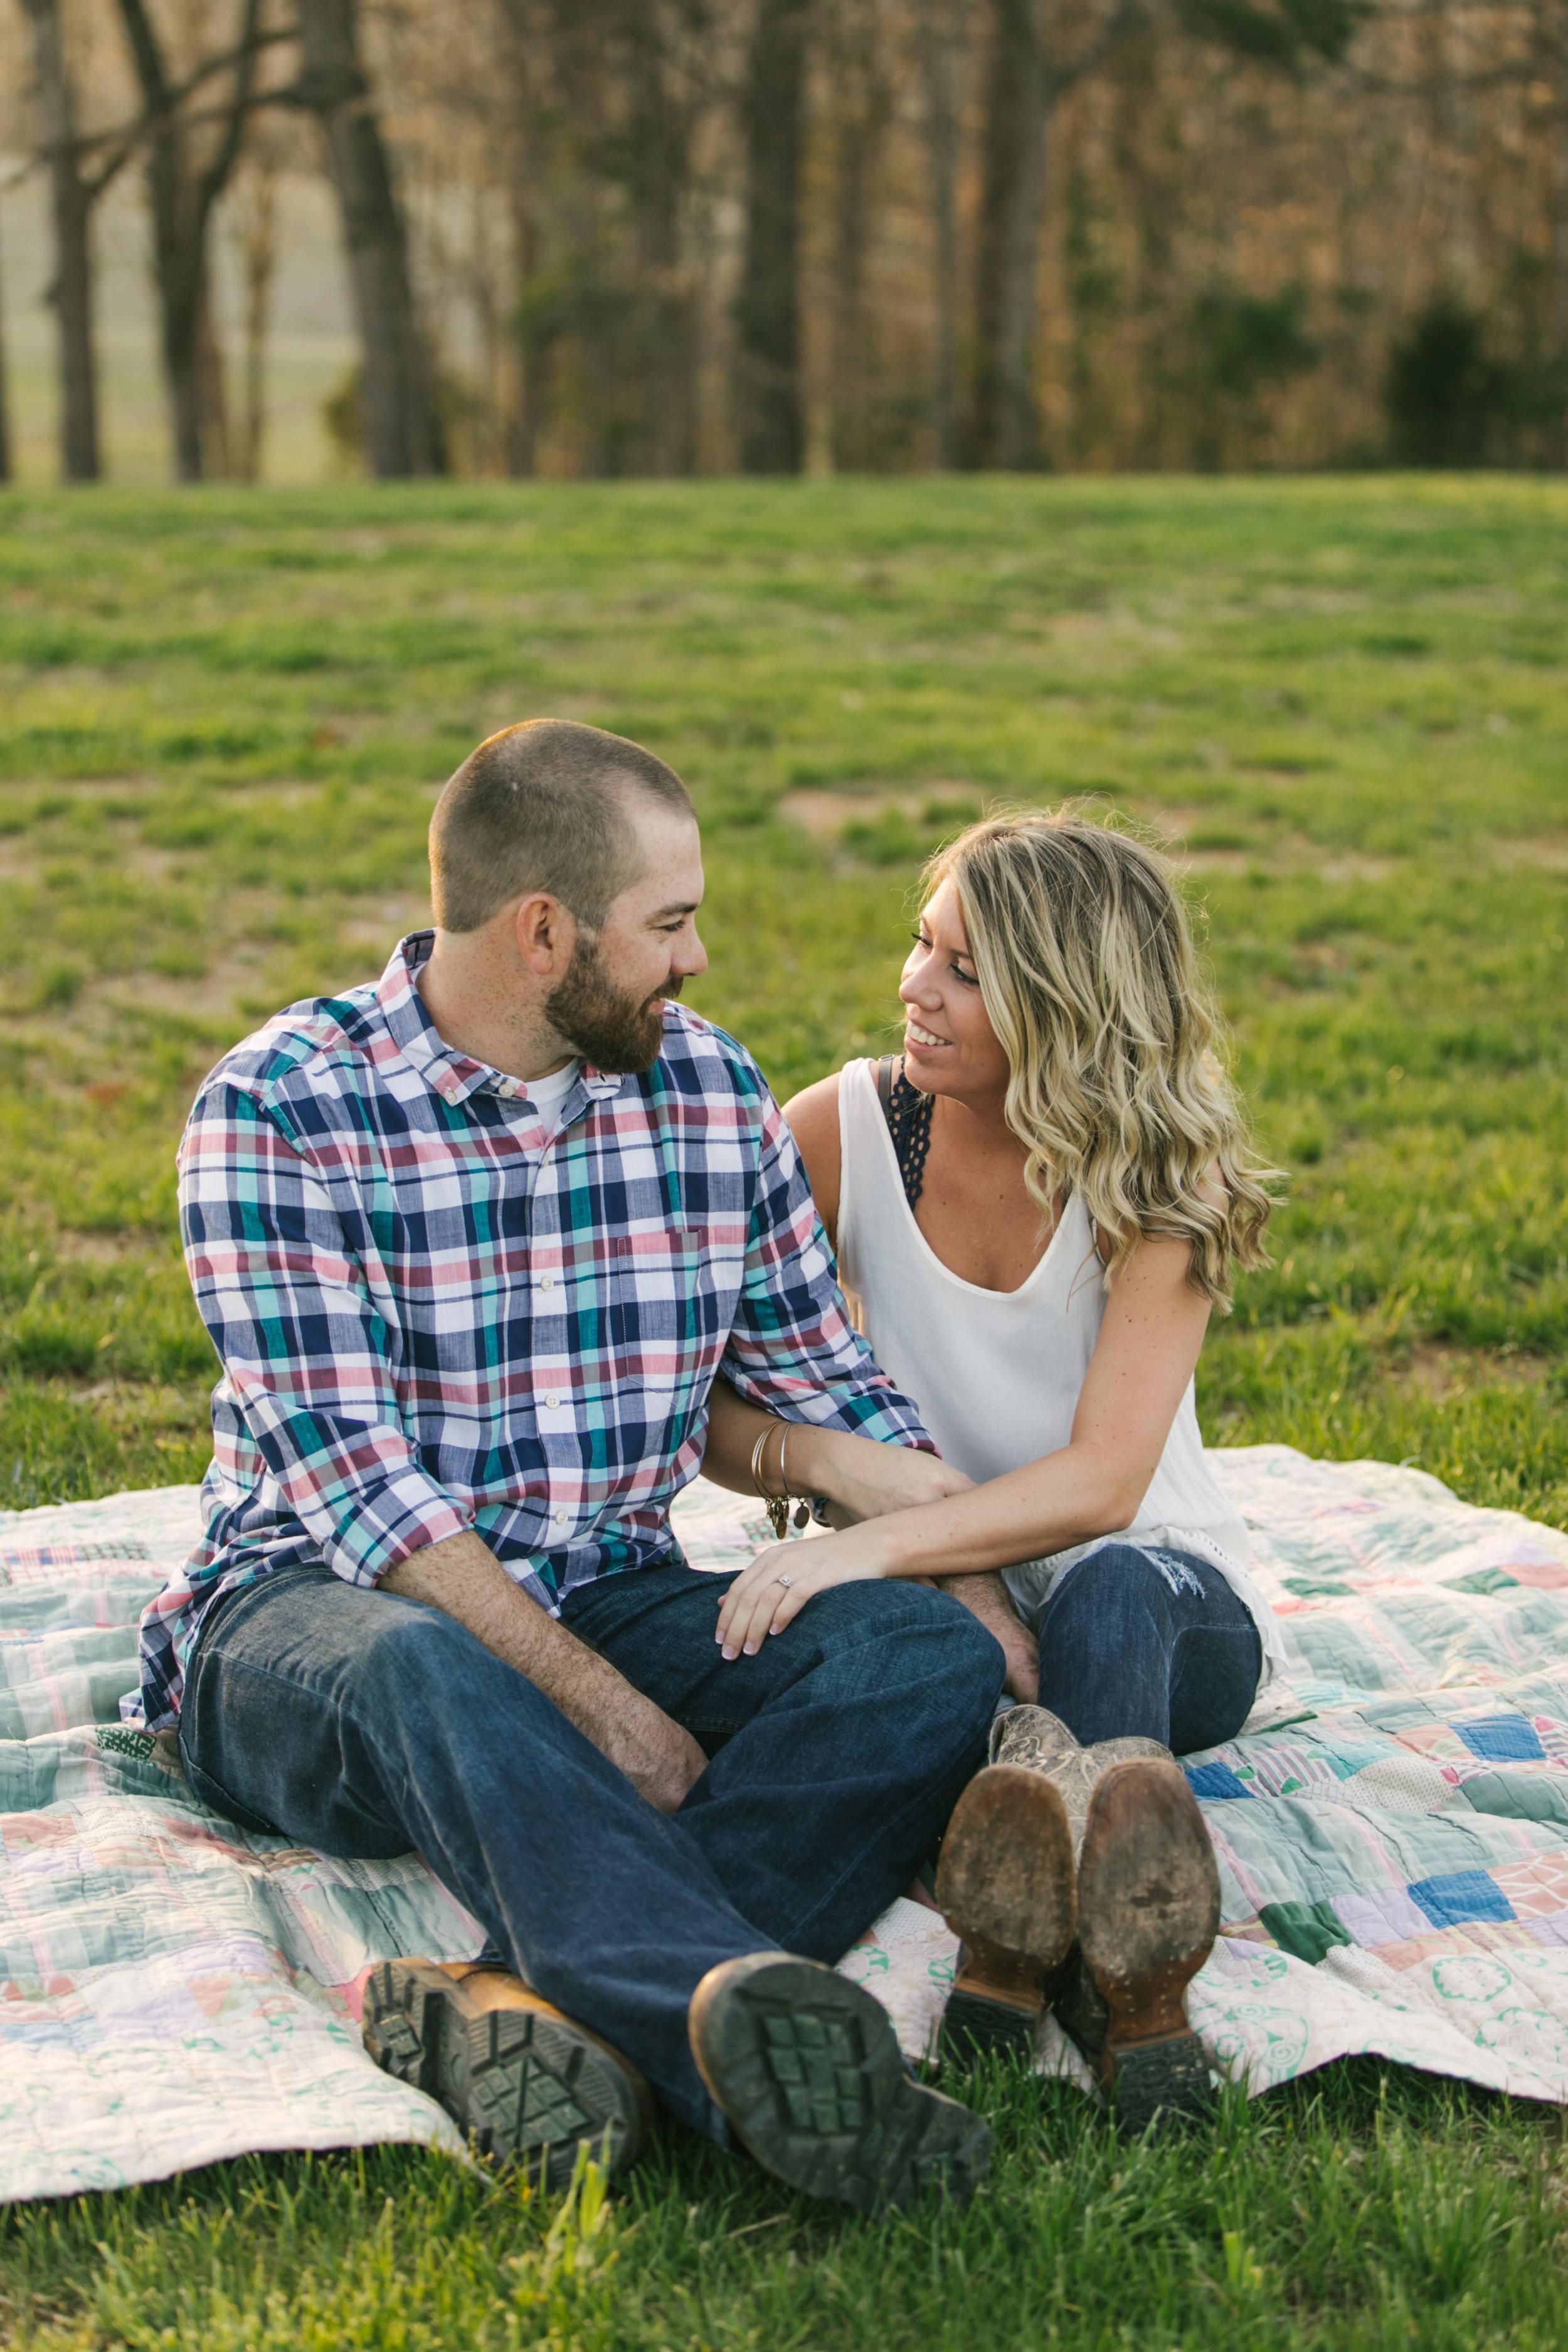 89_Cory+Danielle_Engagement.jpg